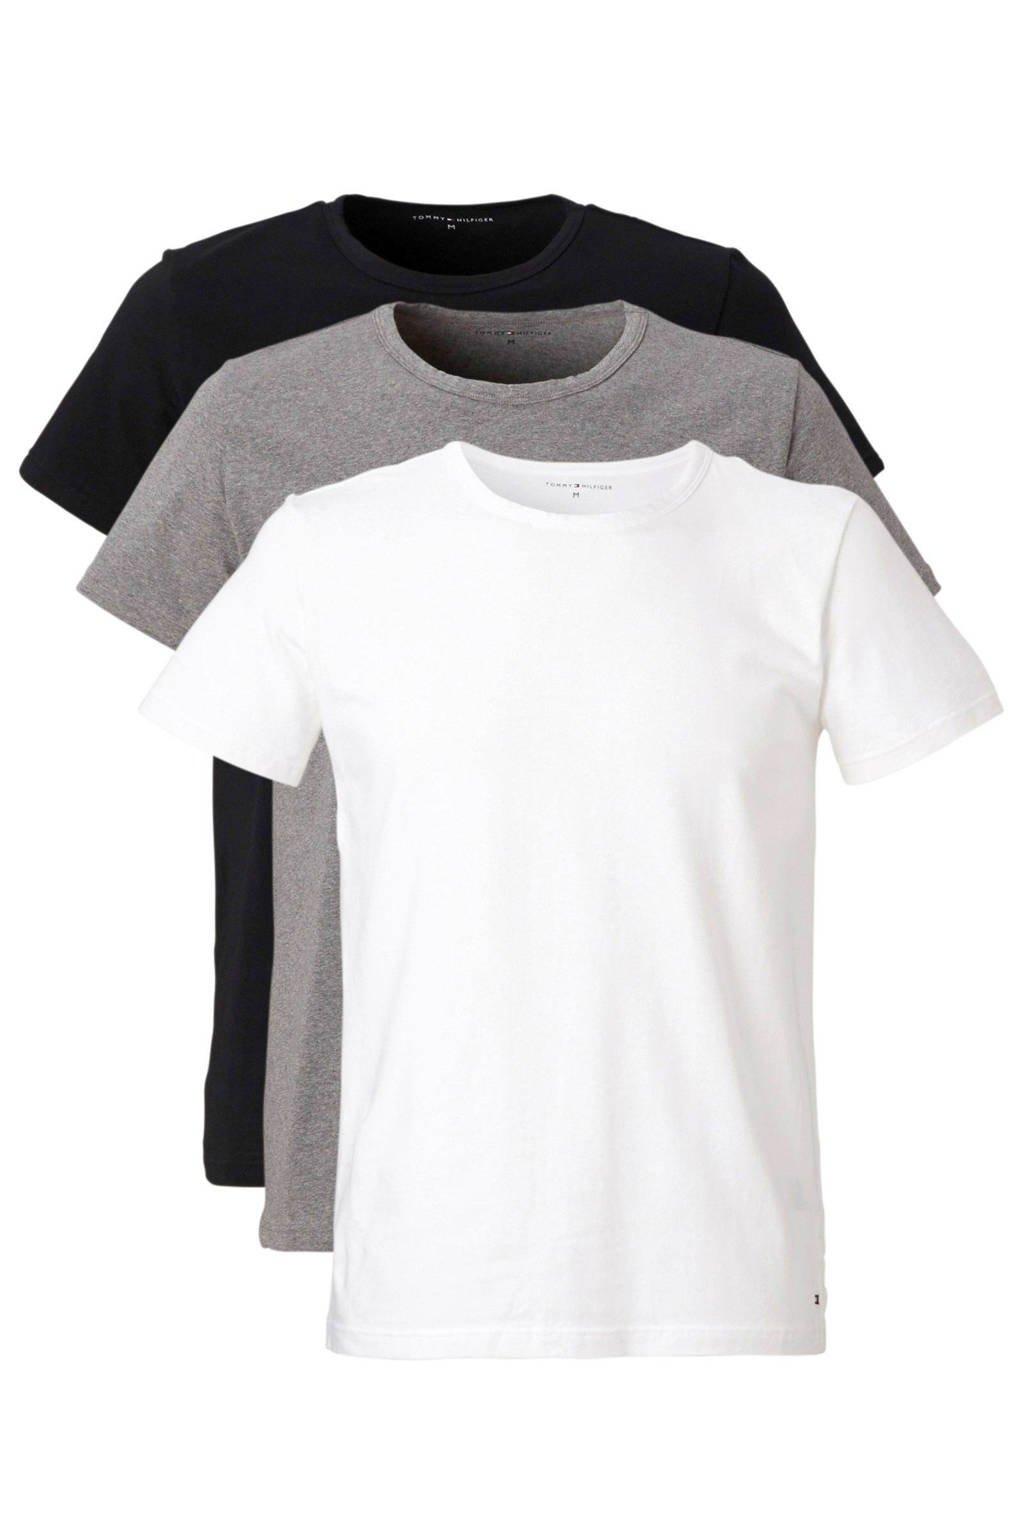 Tommy Hilfiger T-shirt (set van 3), Zwart/grijs/wit